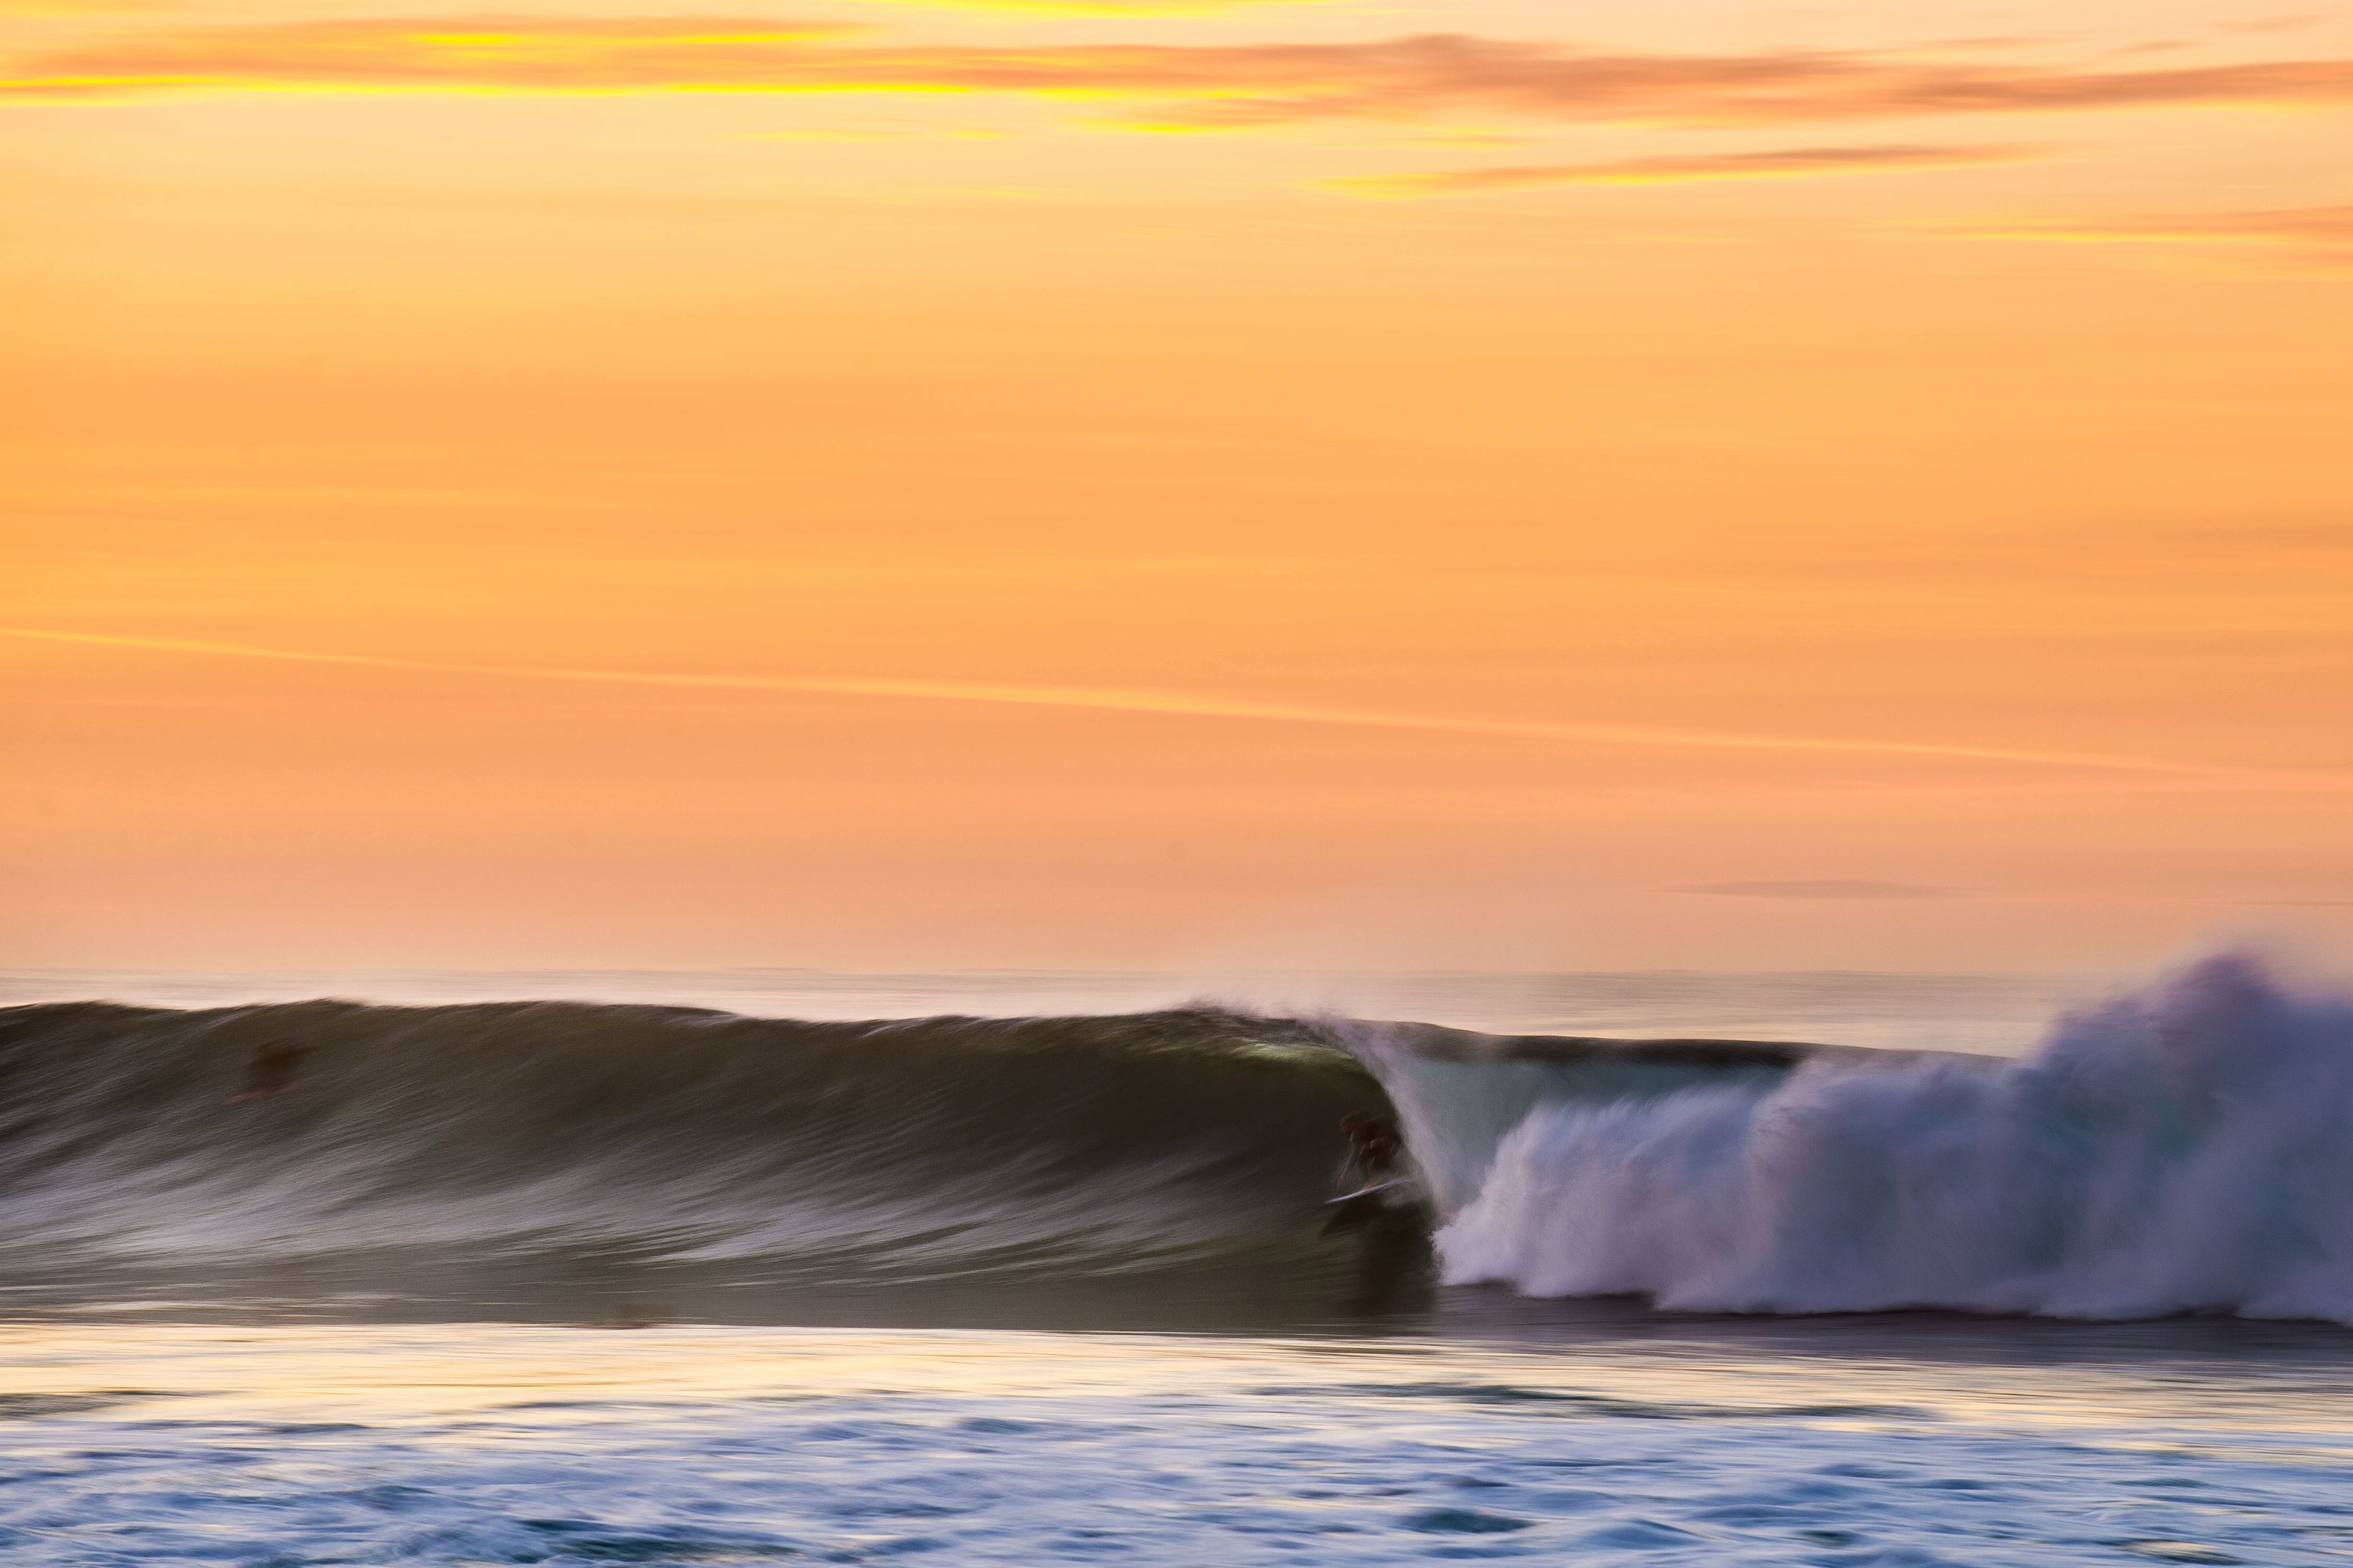 Mick Fanning surft in Torquay, Victoria. Credit: Trevor Moran / Red Bull Content Pool